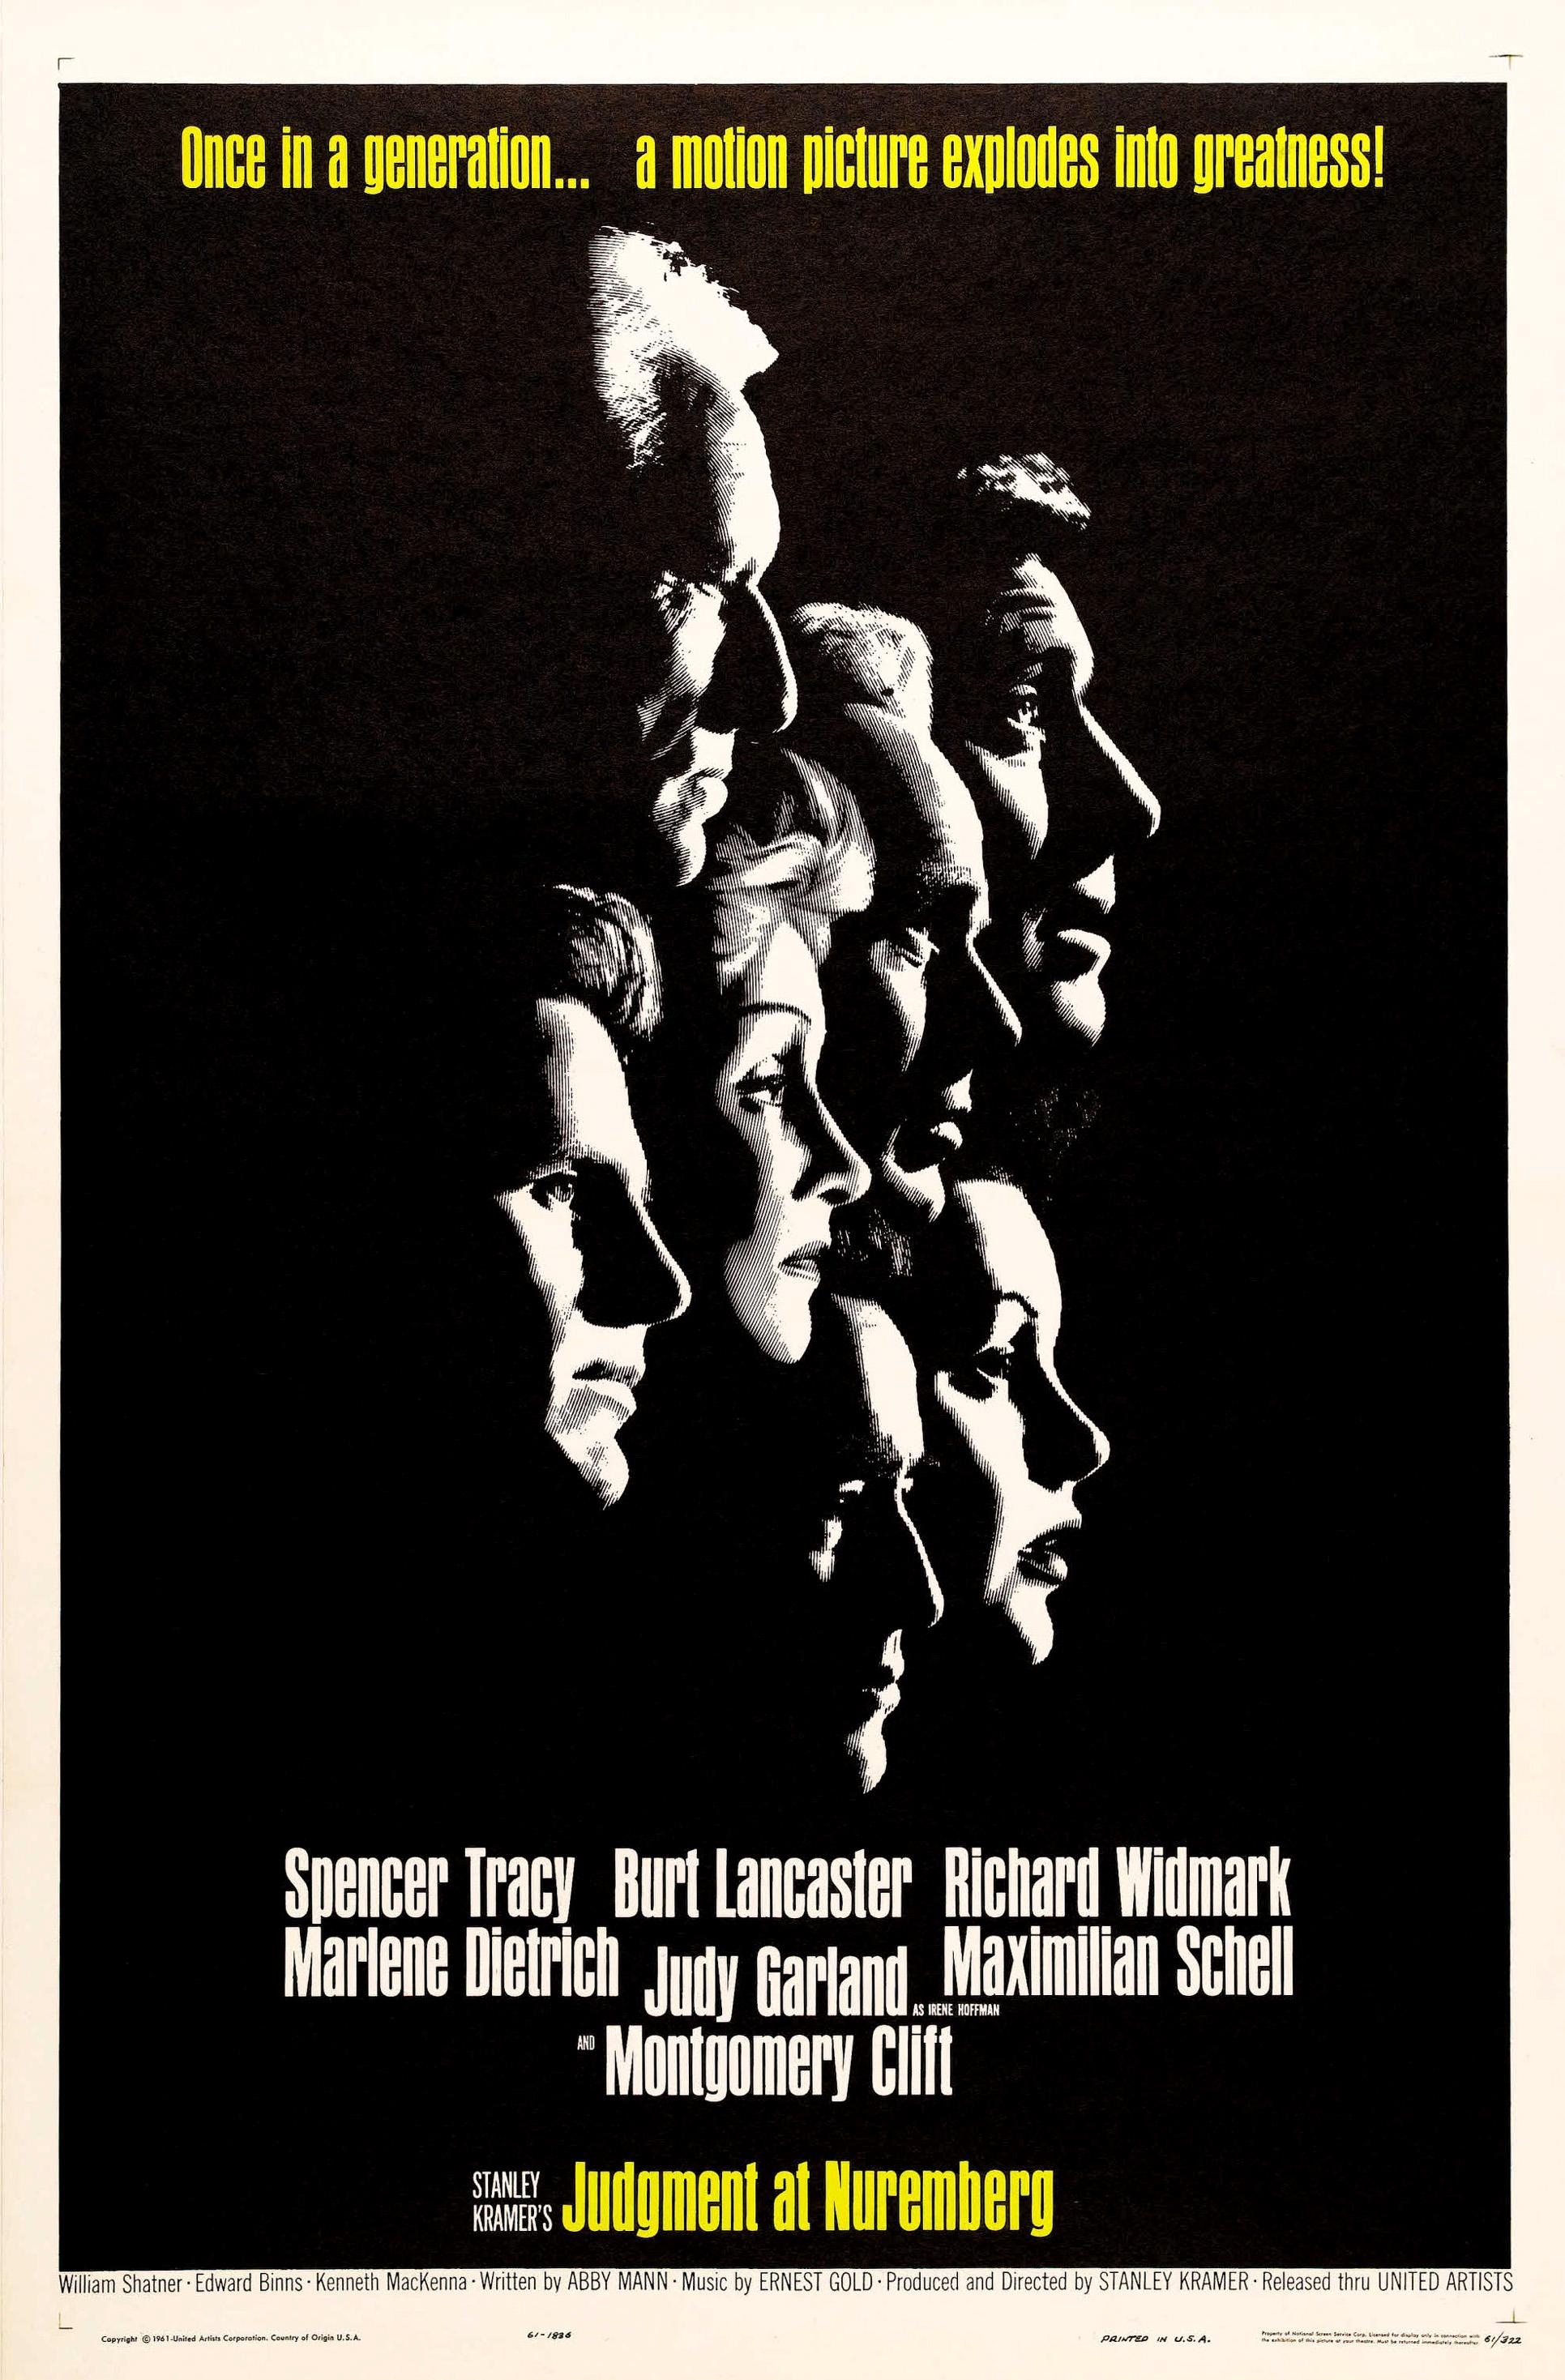 OTRO PUTO TÓPIC NO MUSICAL. Obras maestras del cine. - Página 2 Judgment_at_Nuremberg_%281961_film_poster%29